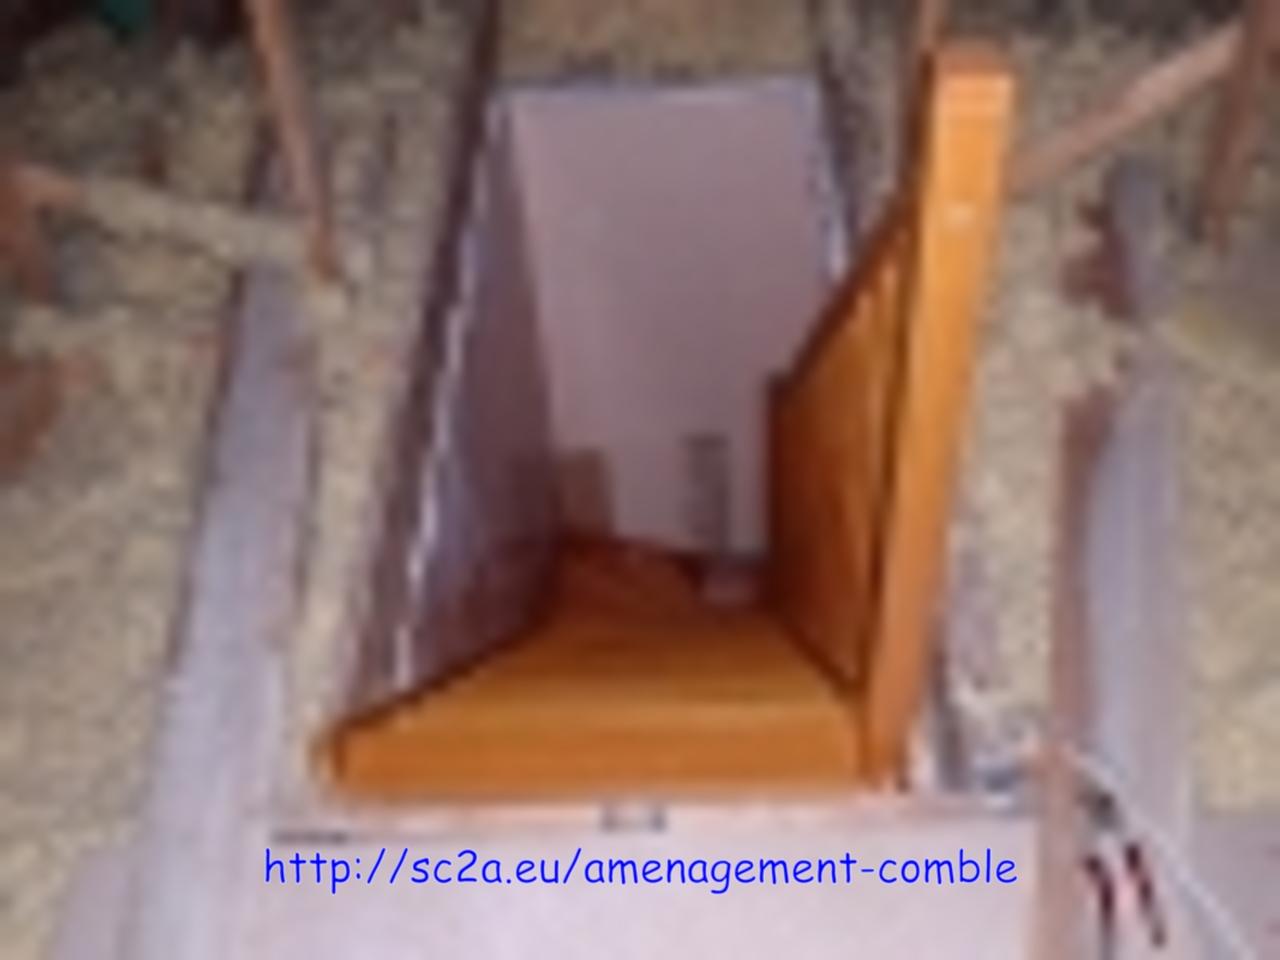 escalier installé provisoirement - escalier en kit - poser son escalier tout seul